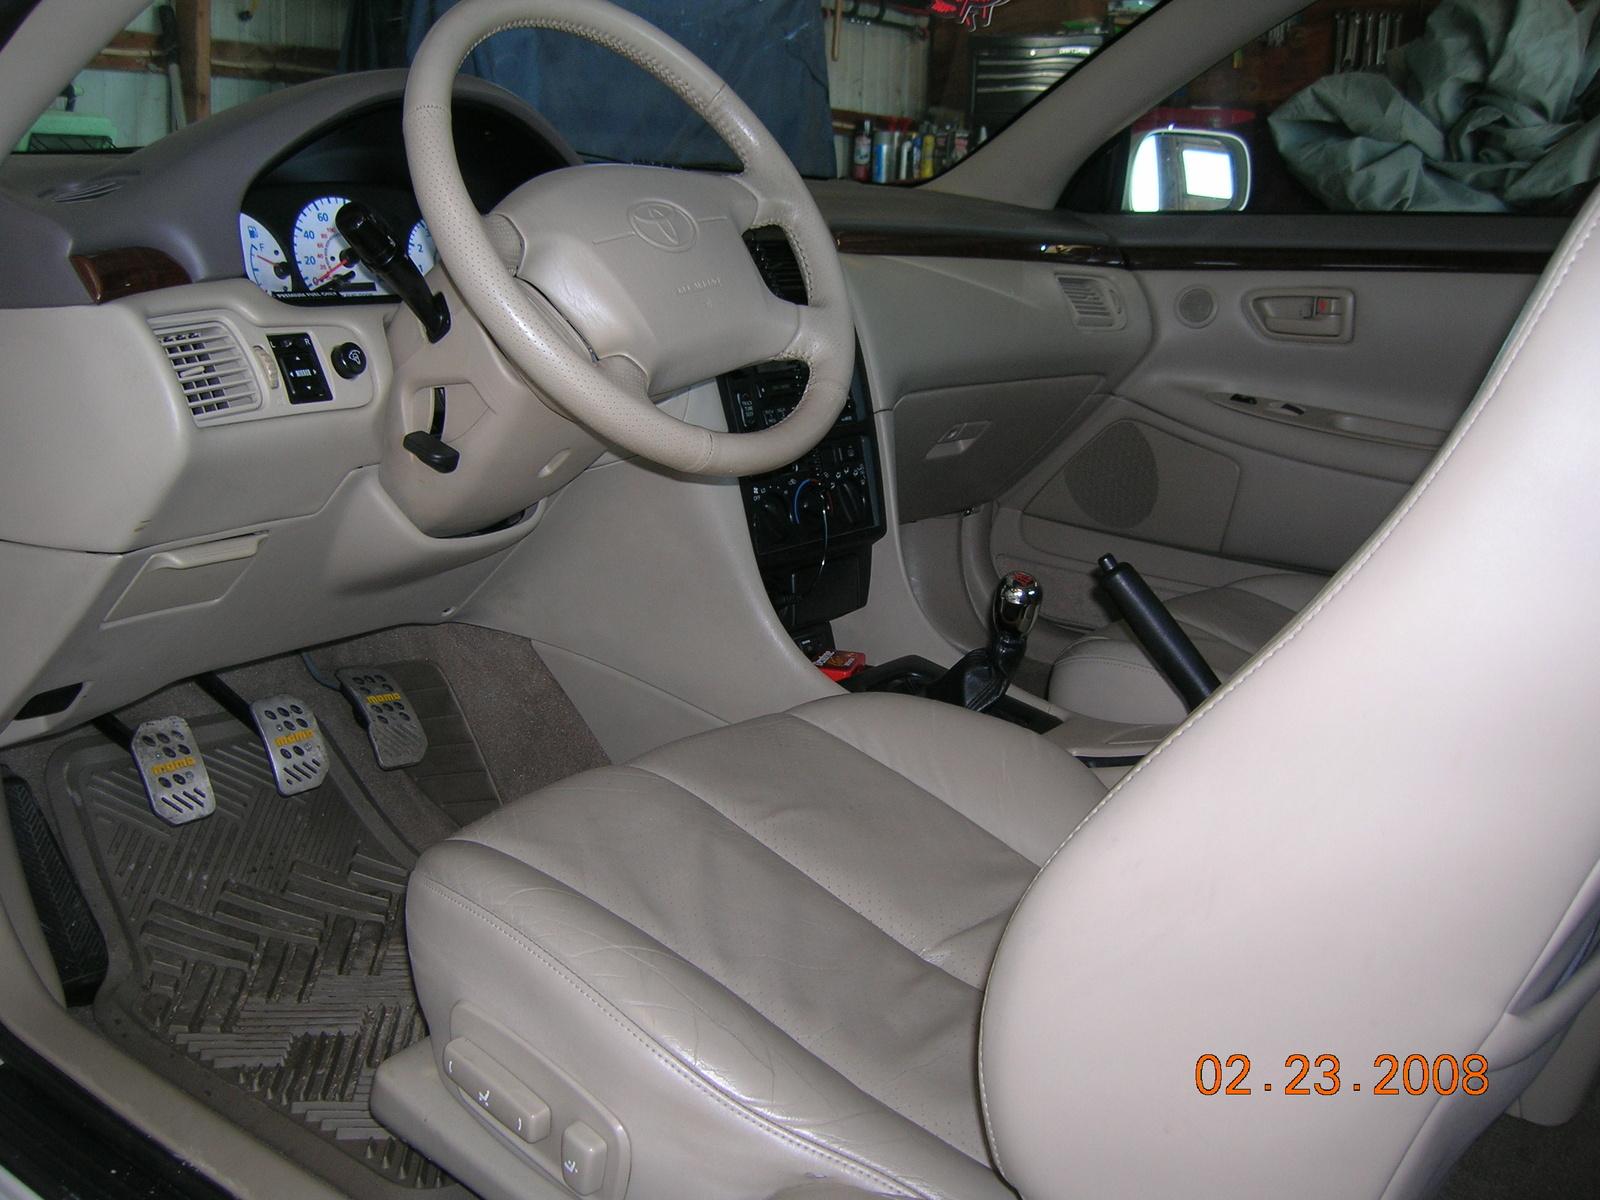 1999 toyota camry solara information and photos zombiedrive rh zombdrive com 1999 camry manual transmission 1999 camry manual pdf